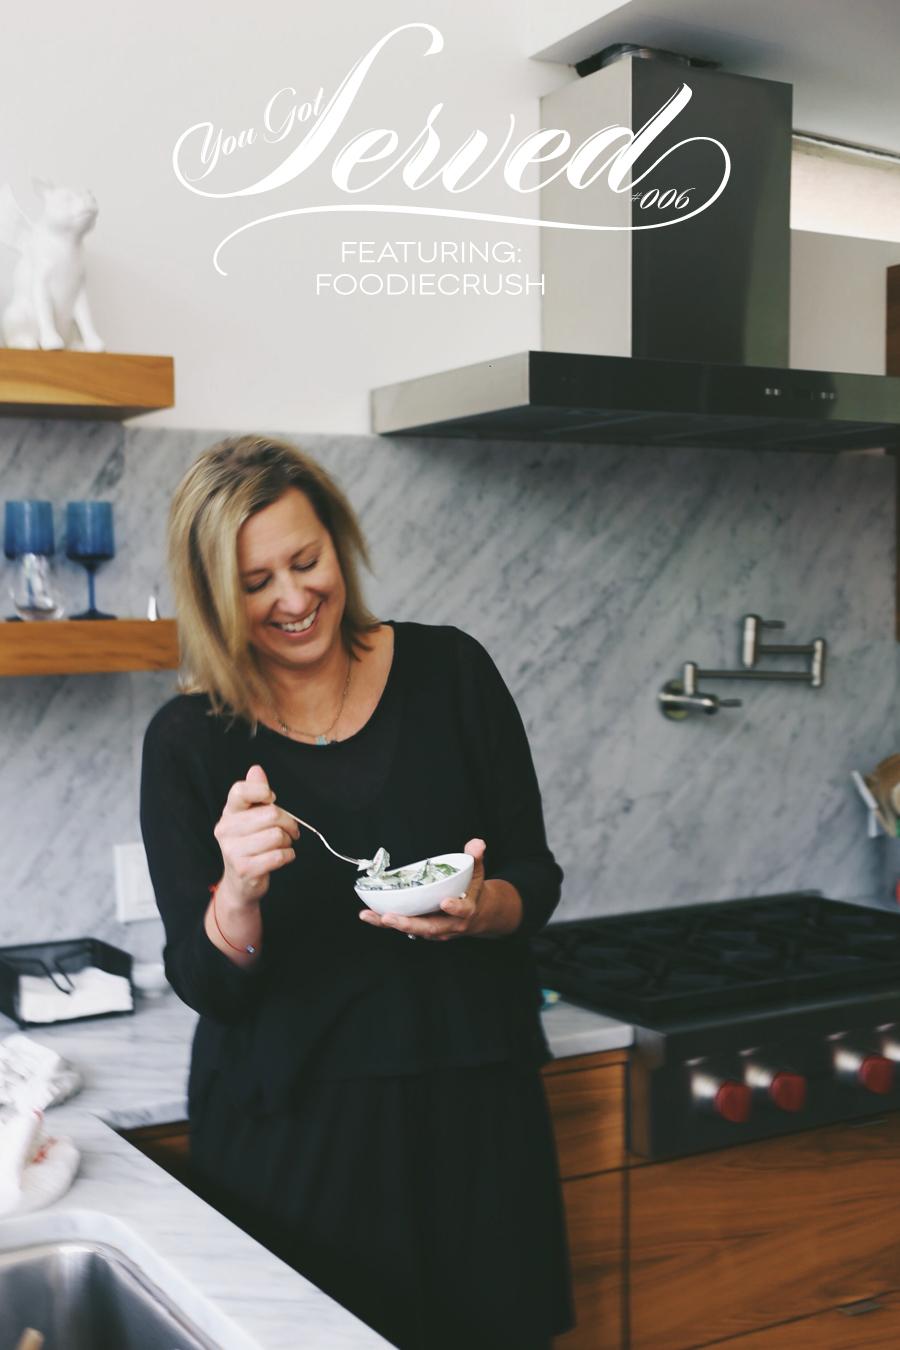 You Got Served: Foodiecrush | Dine X Design